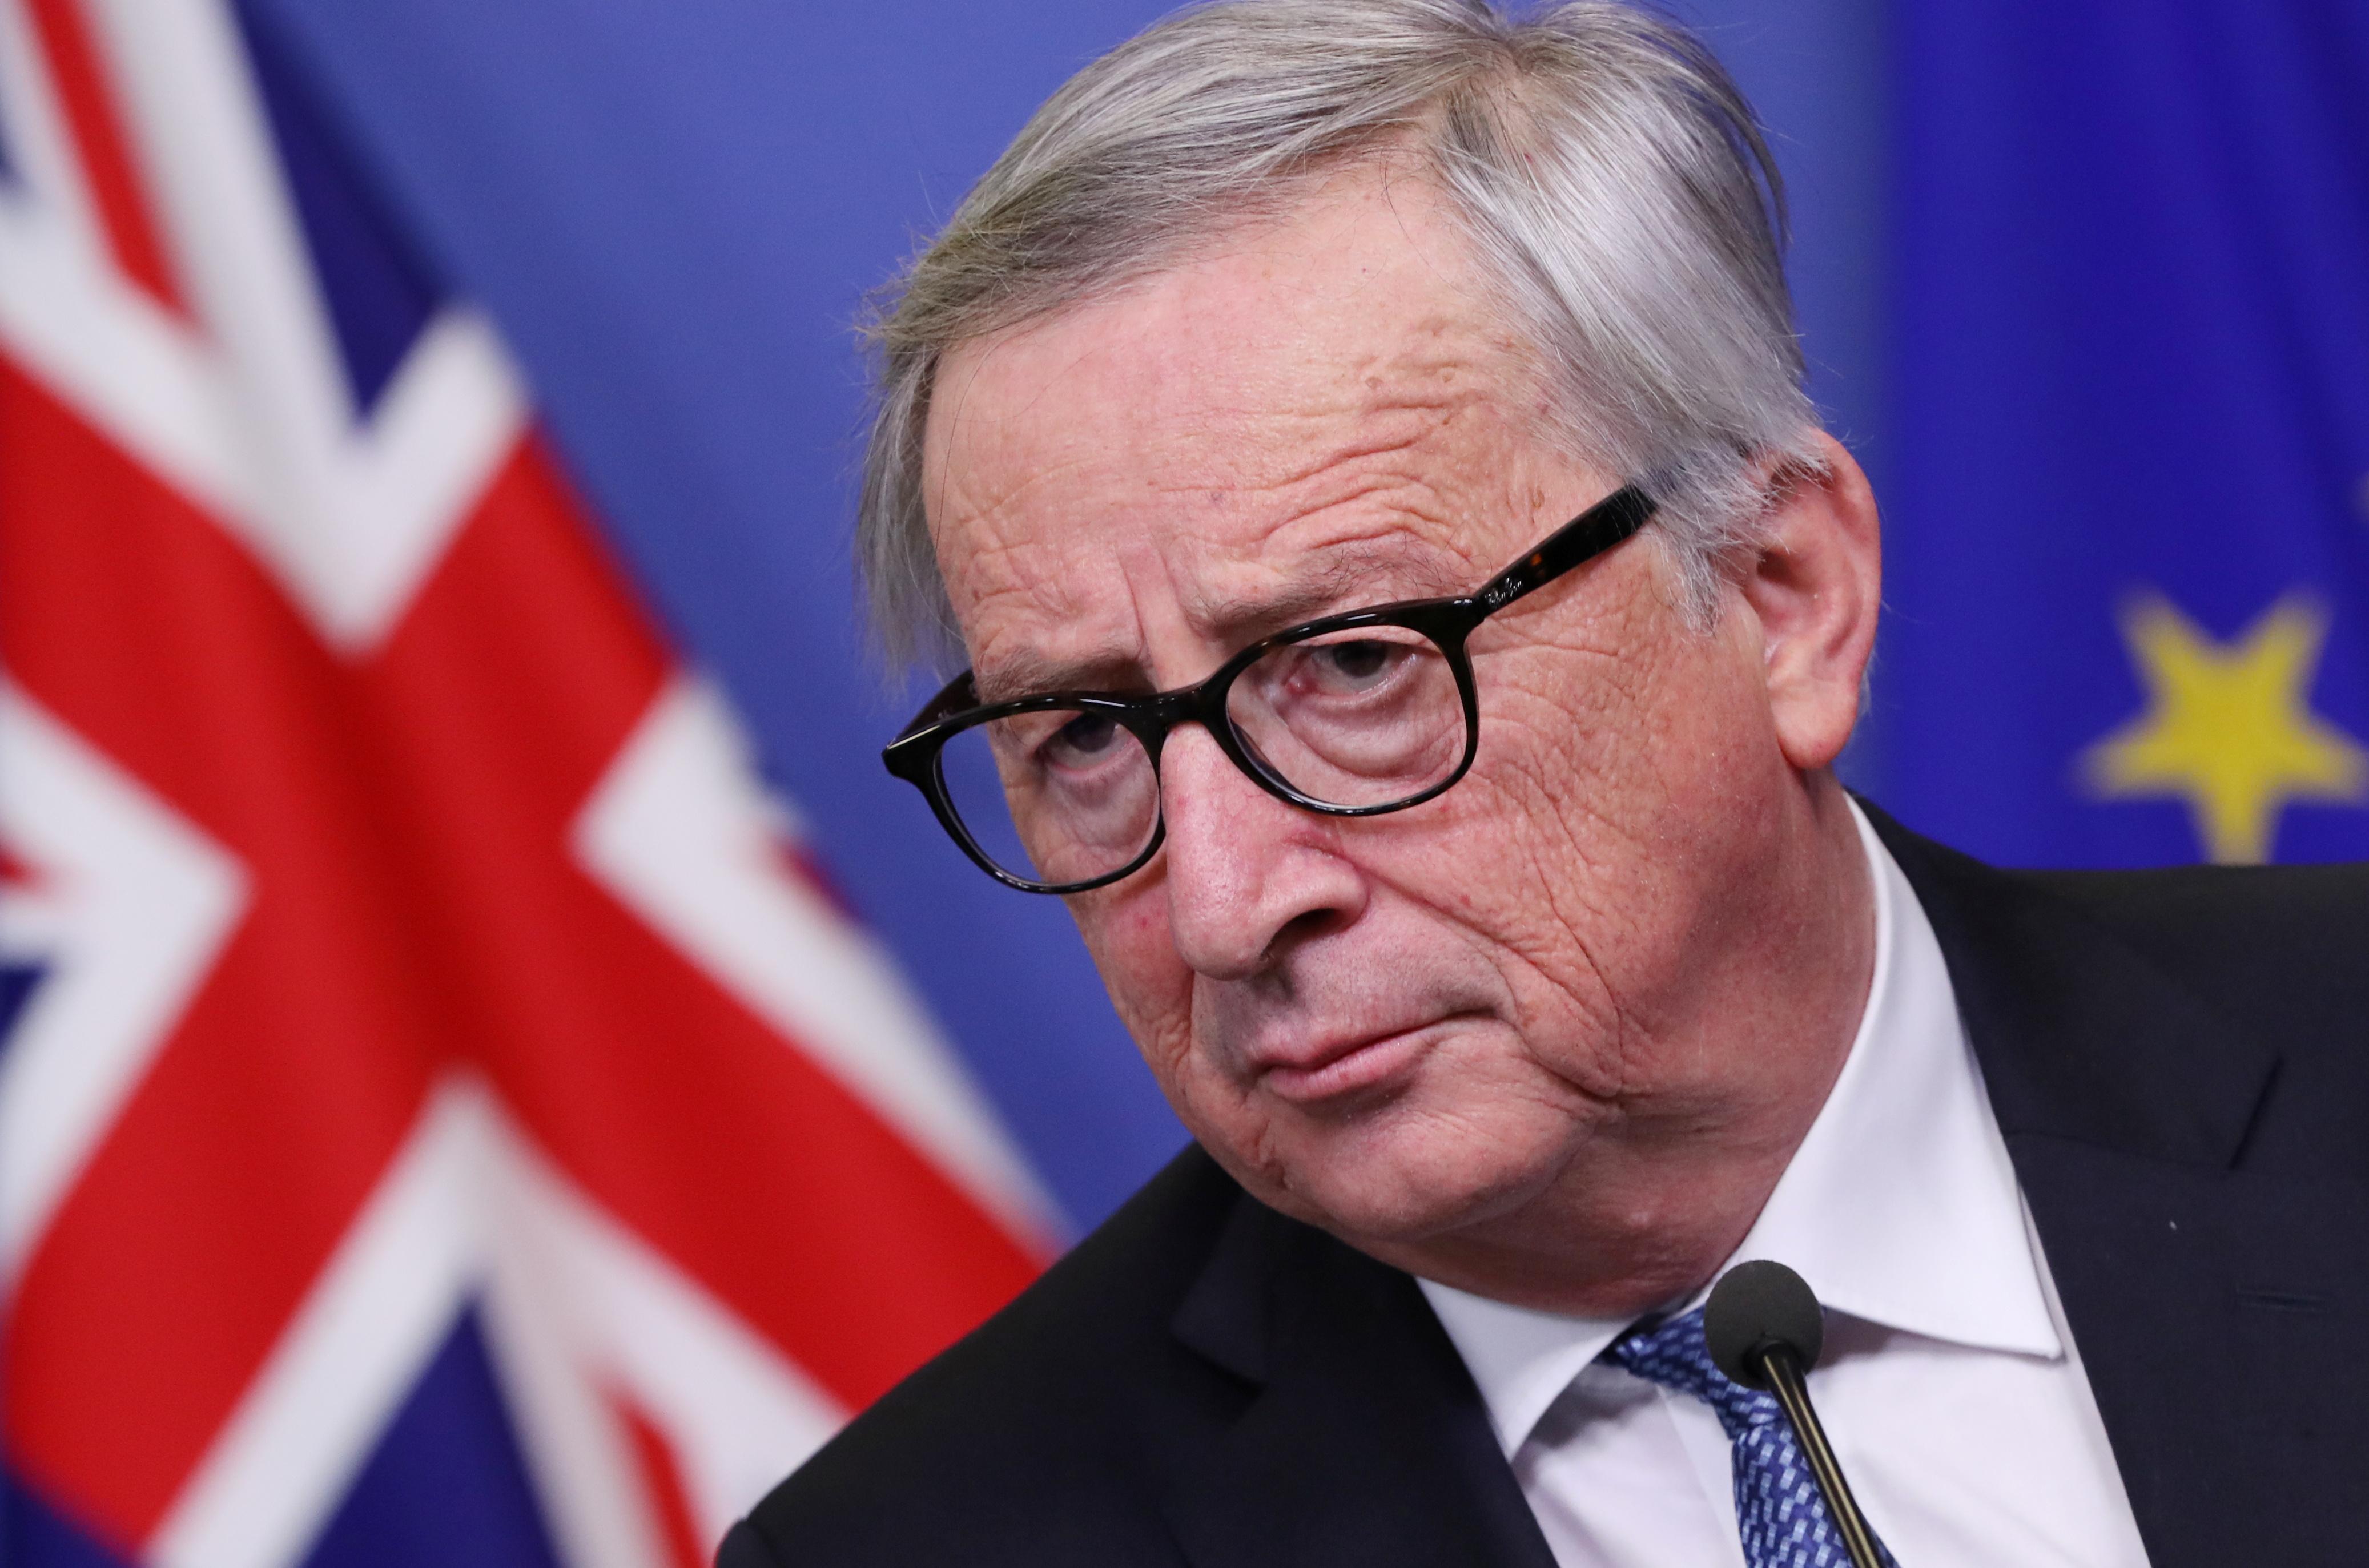 EU's Juncker tells Britain's May: Brexit deal won't be renegotiated